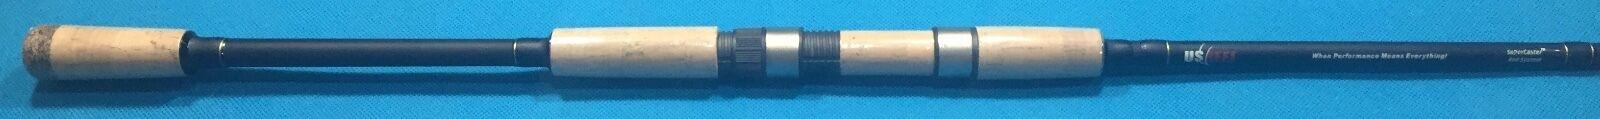 NEW  U.S. Reel Fishing Rod 8' 6  - Super Caster System - SCSXL86 - Very Rare